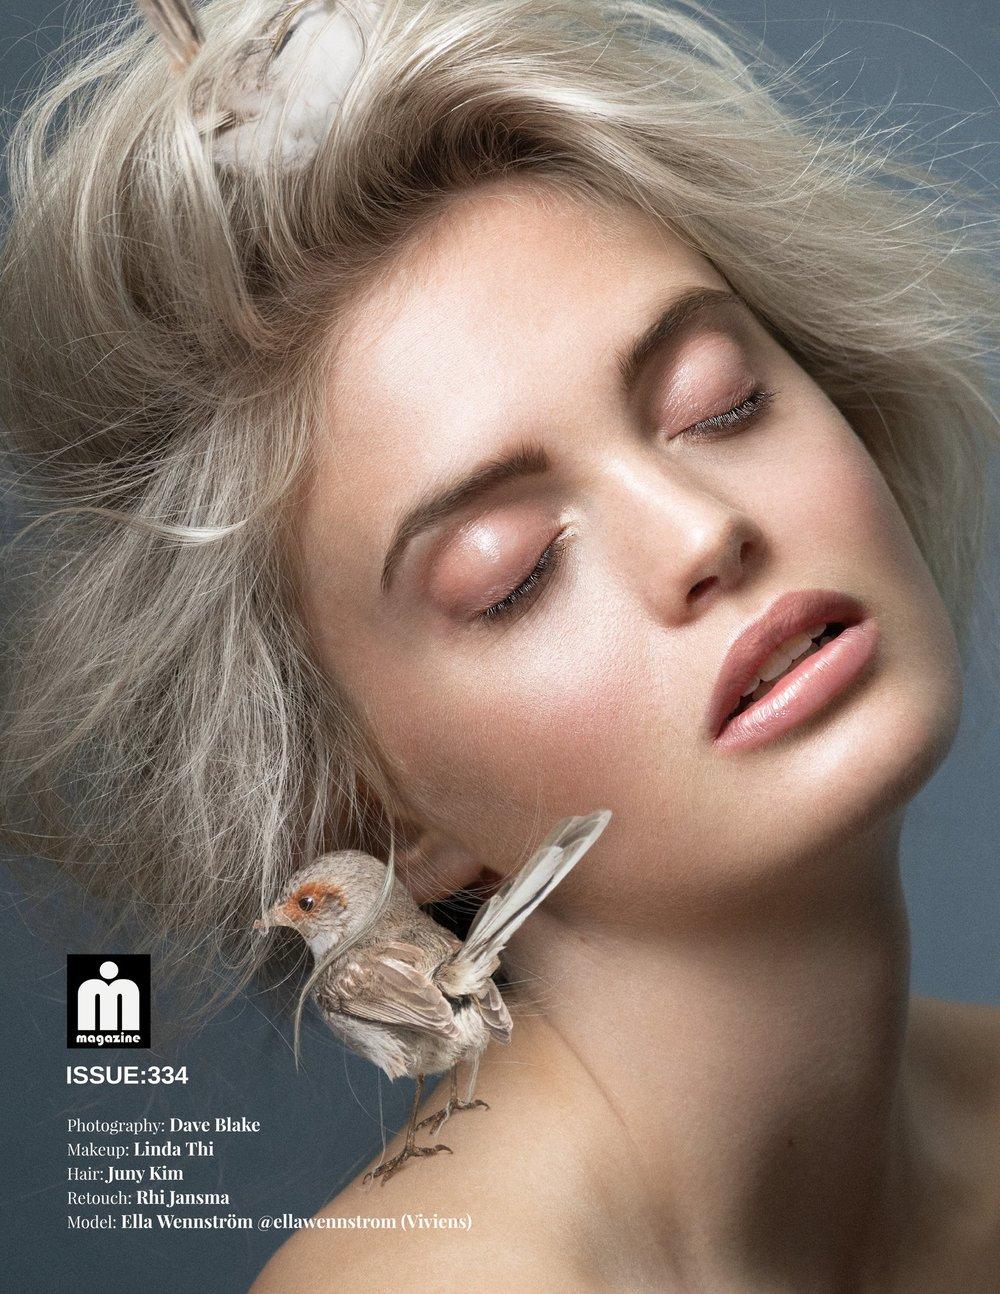 Itty Bitty Barbershop - NEW WORK FOR IMIRAGEmagazinePhotography: Dave BlakeMakeup: Linda ThiHair: Juny KimRetouch: Rhi JansmaModel: Ella Wennström @ellawennstrom (Viviens)Location: Sydney and Byron Bay, Australia.